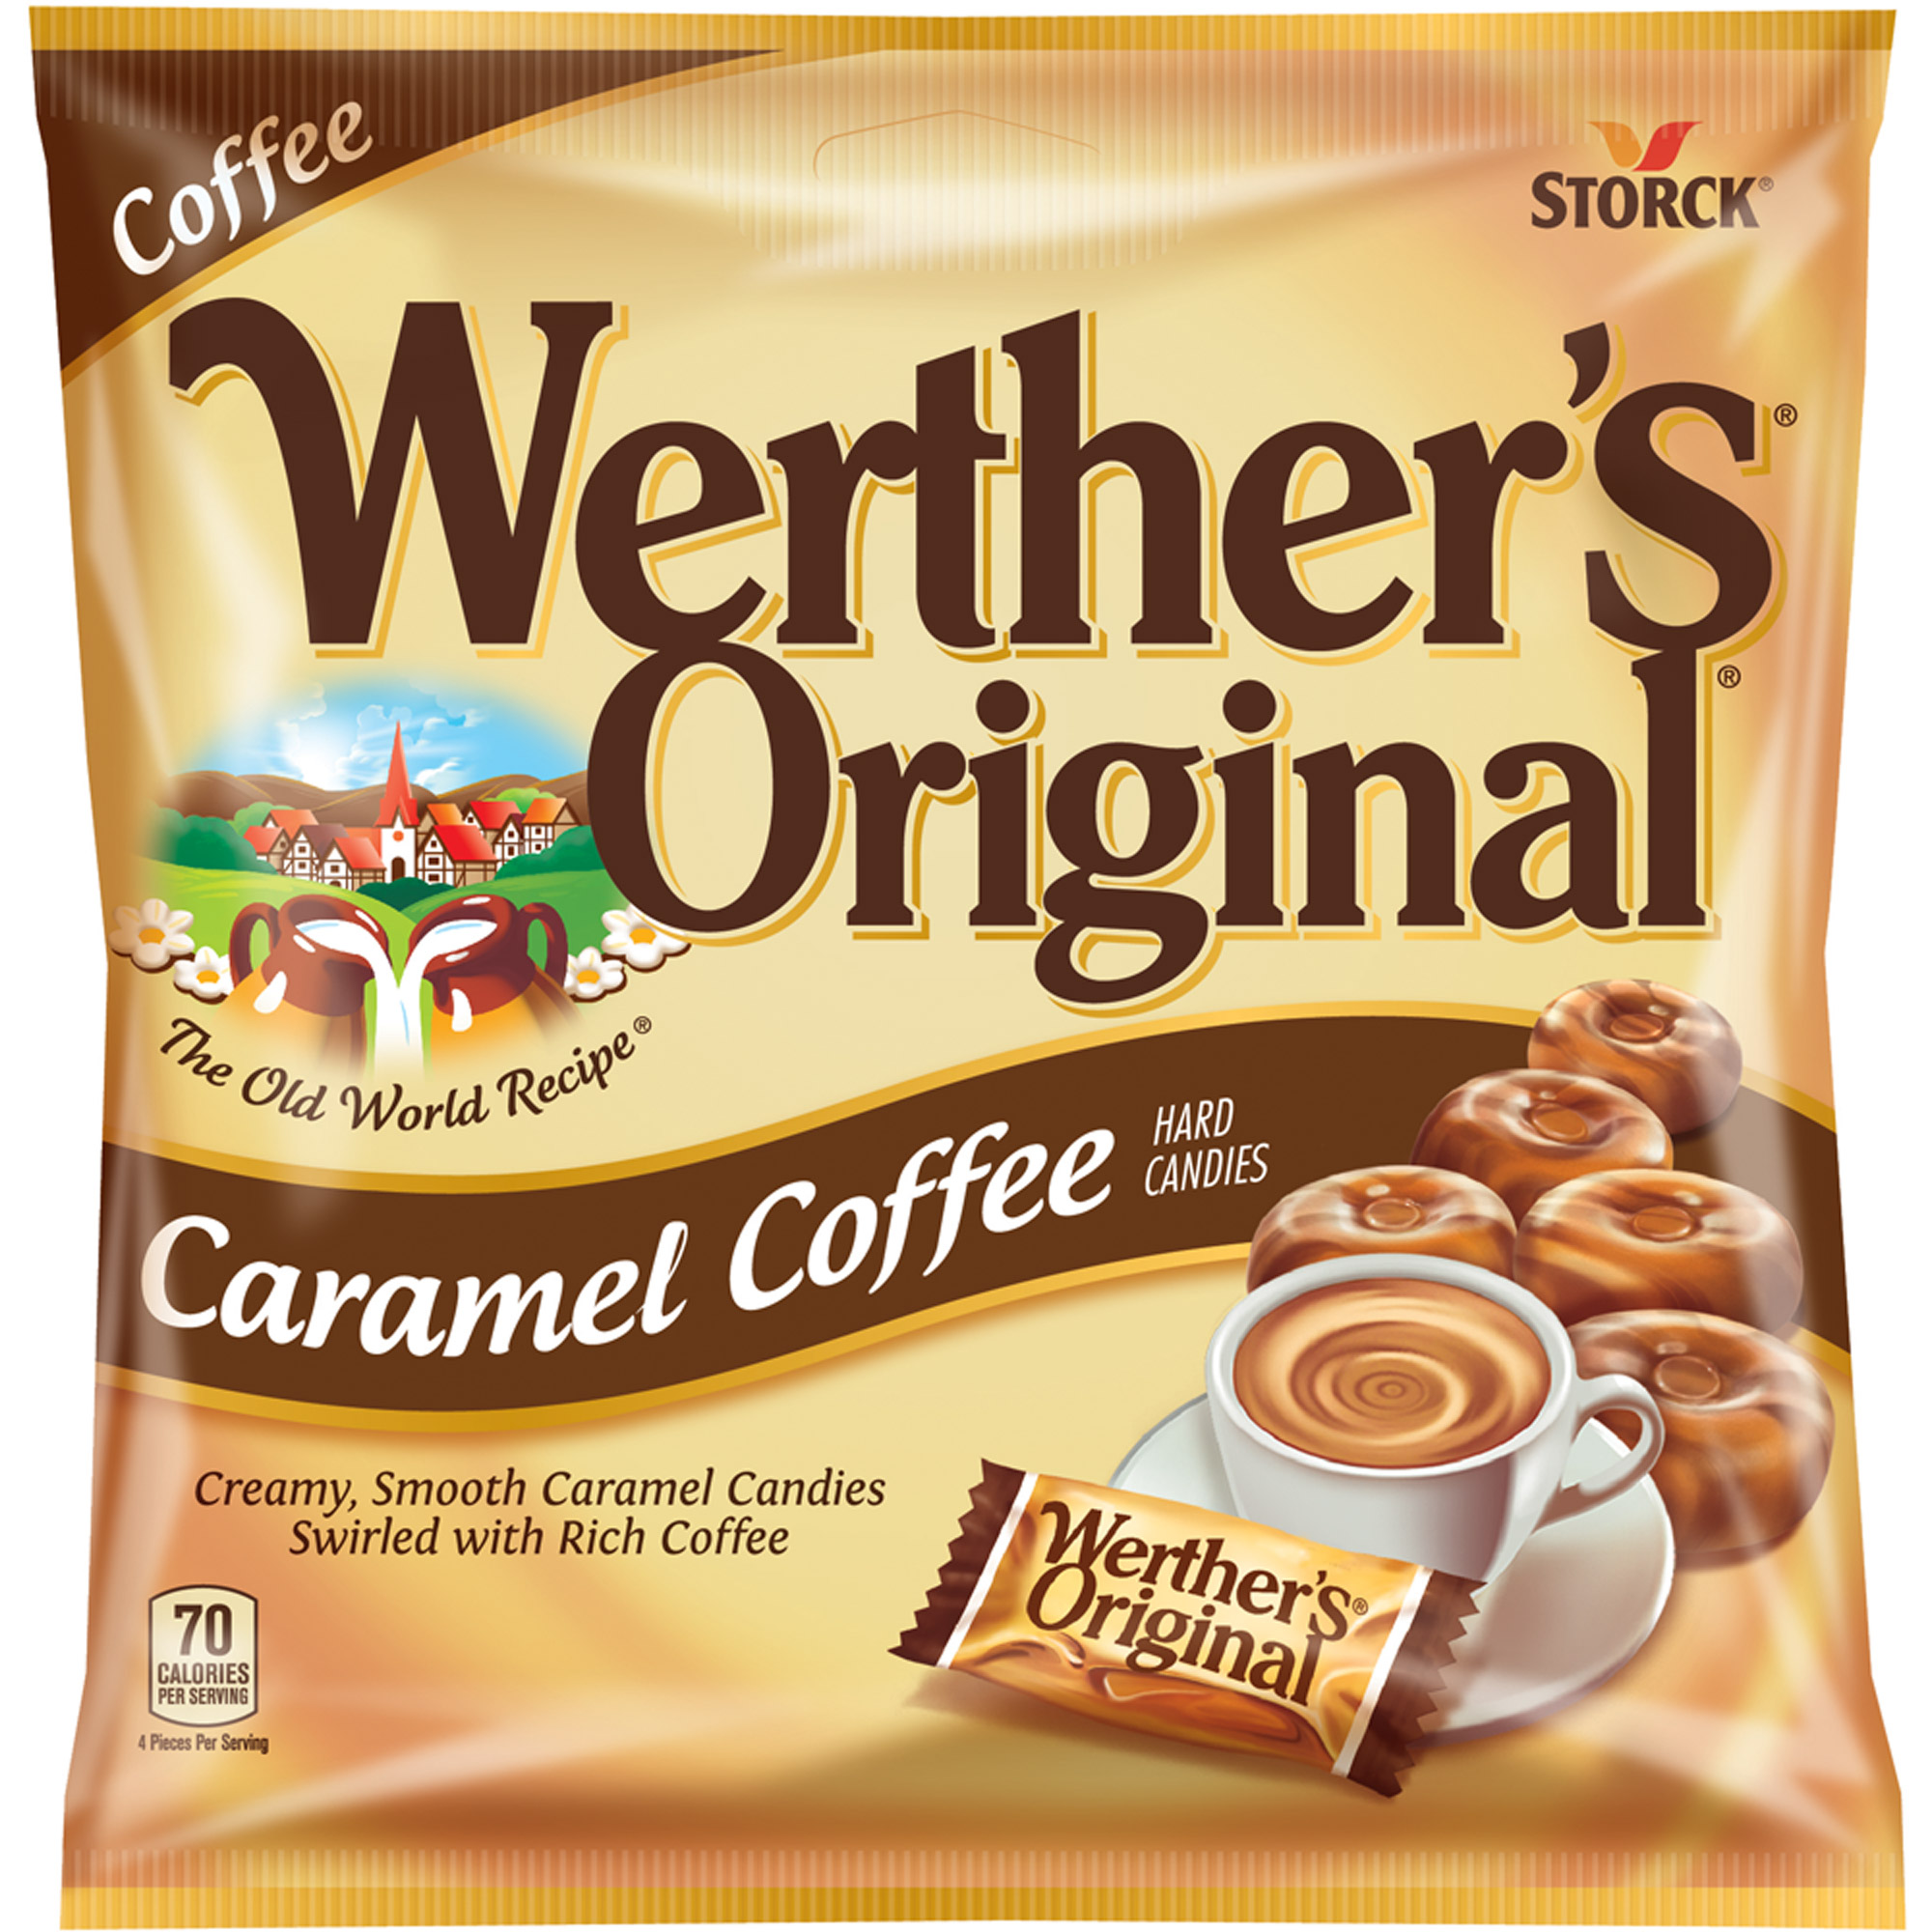 Werther\'s Original, Caramel Coffee Hard Candies, 5.5 Oz - Walmart.com